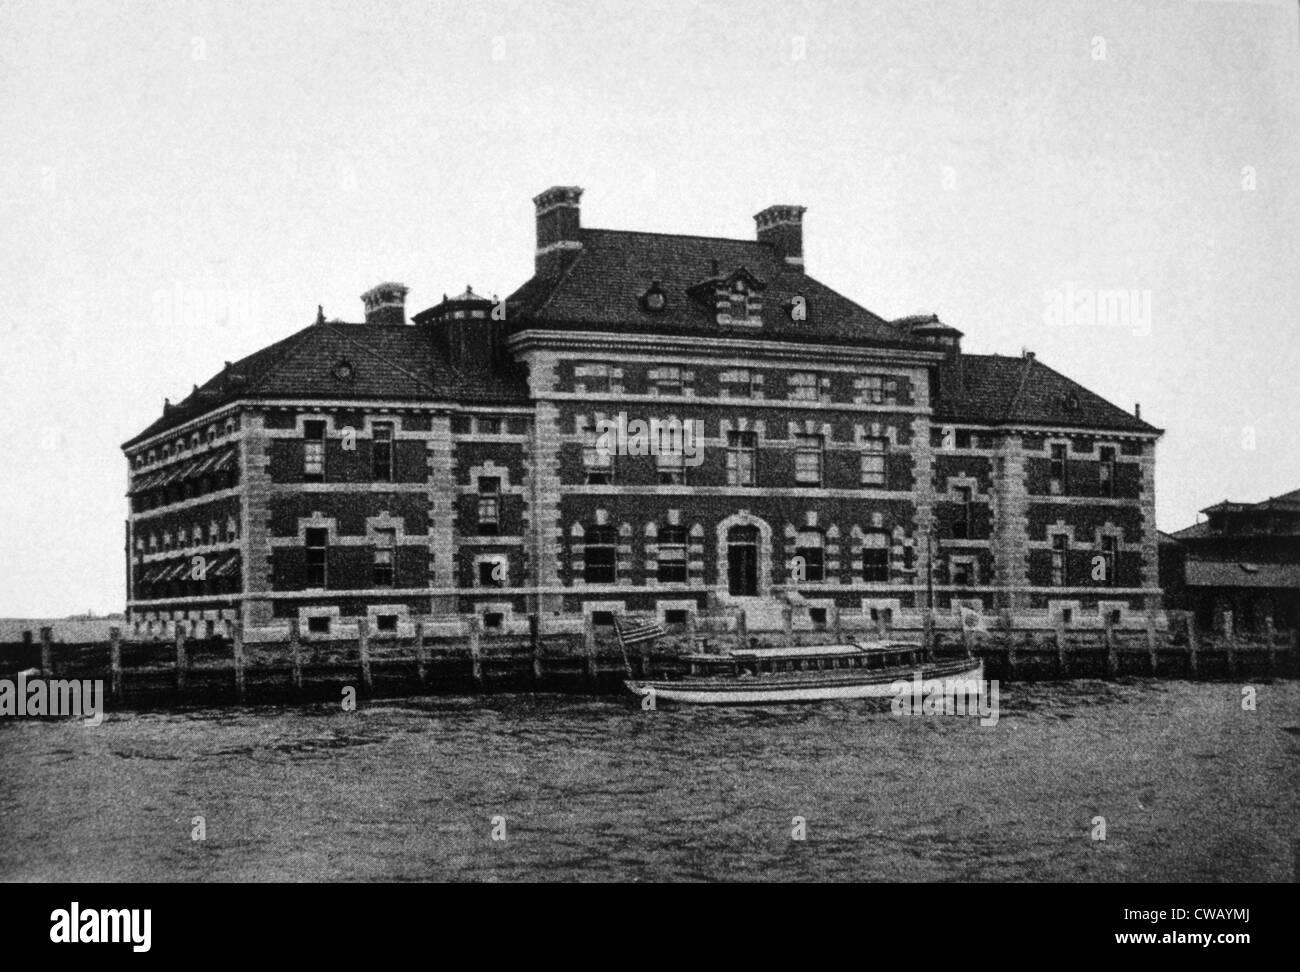 Ellis Island New Hospital Building, c. 1902. - Stock Image